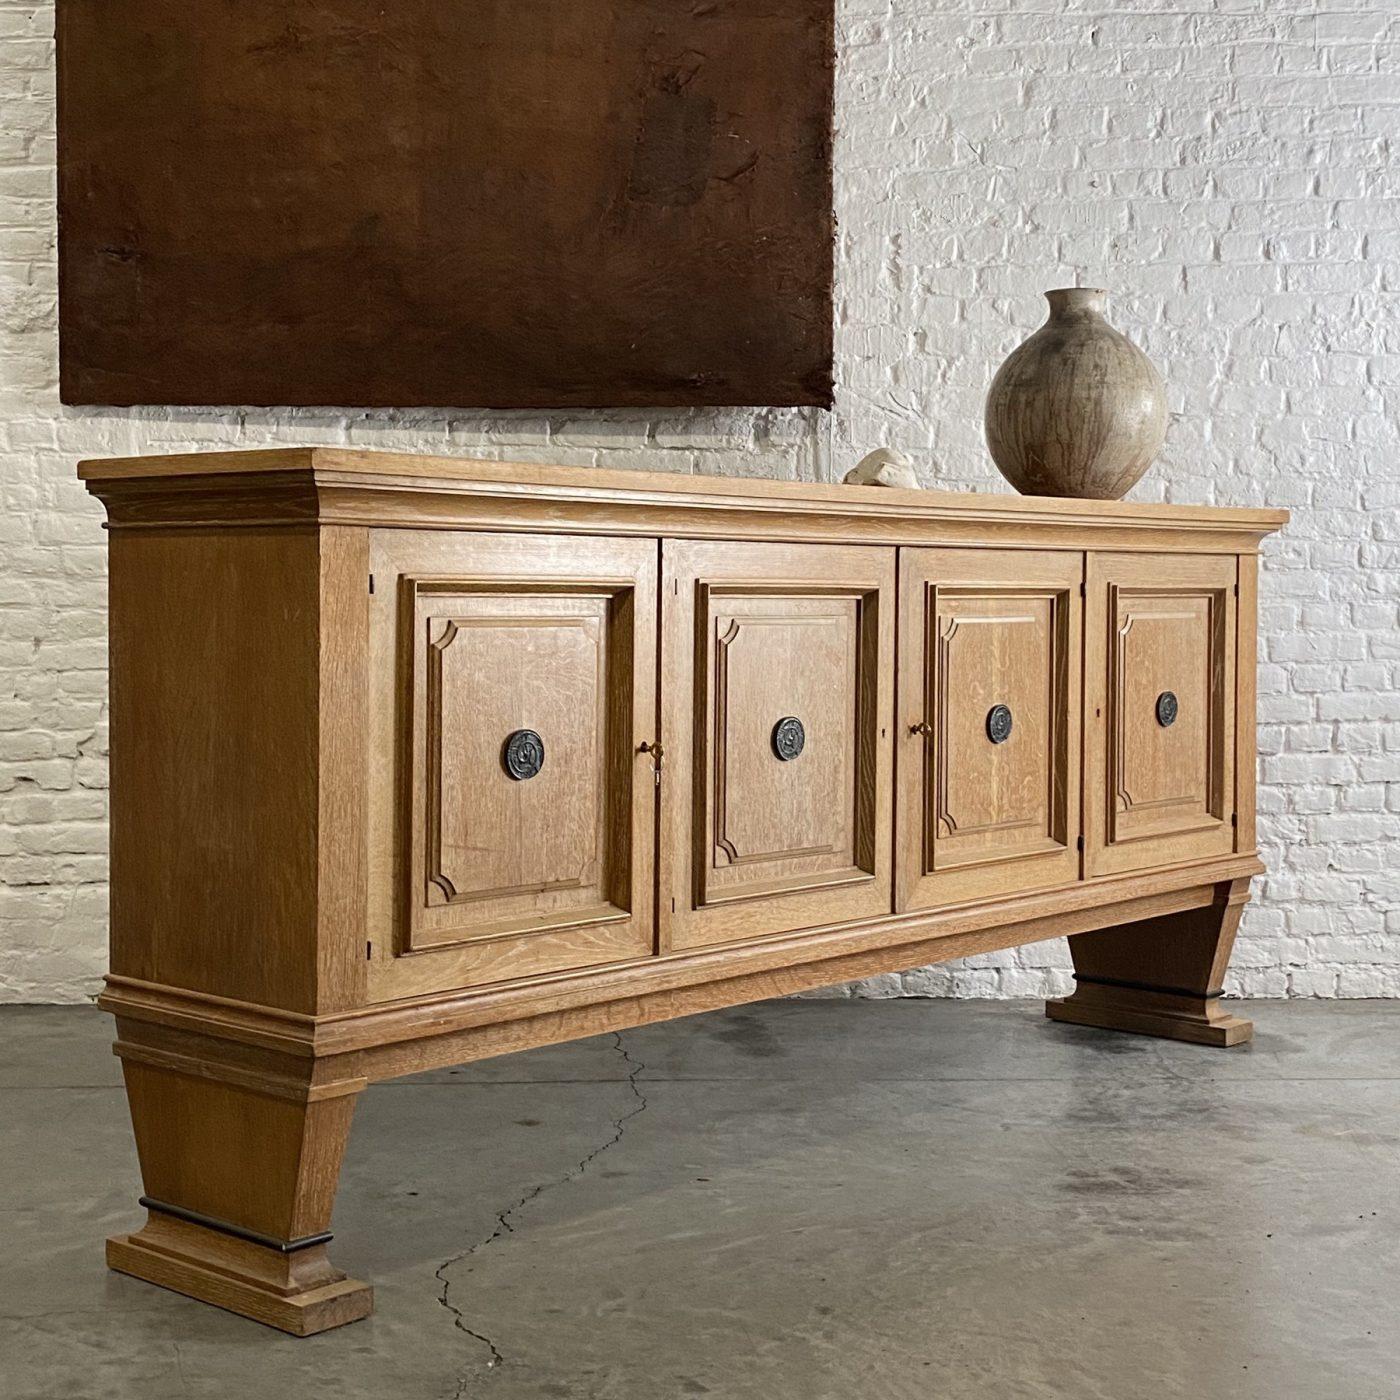 objet-vagabond-oak-sideboard0003